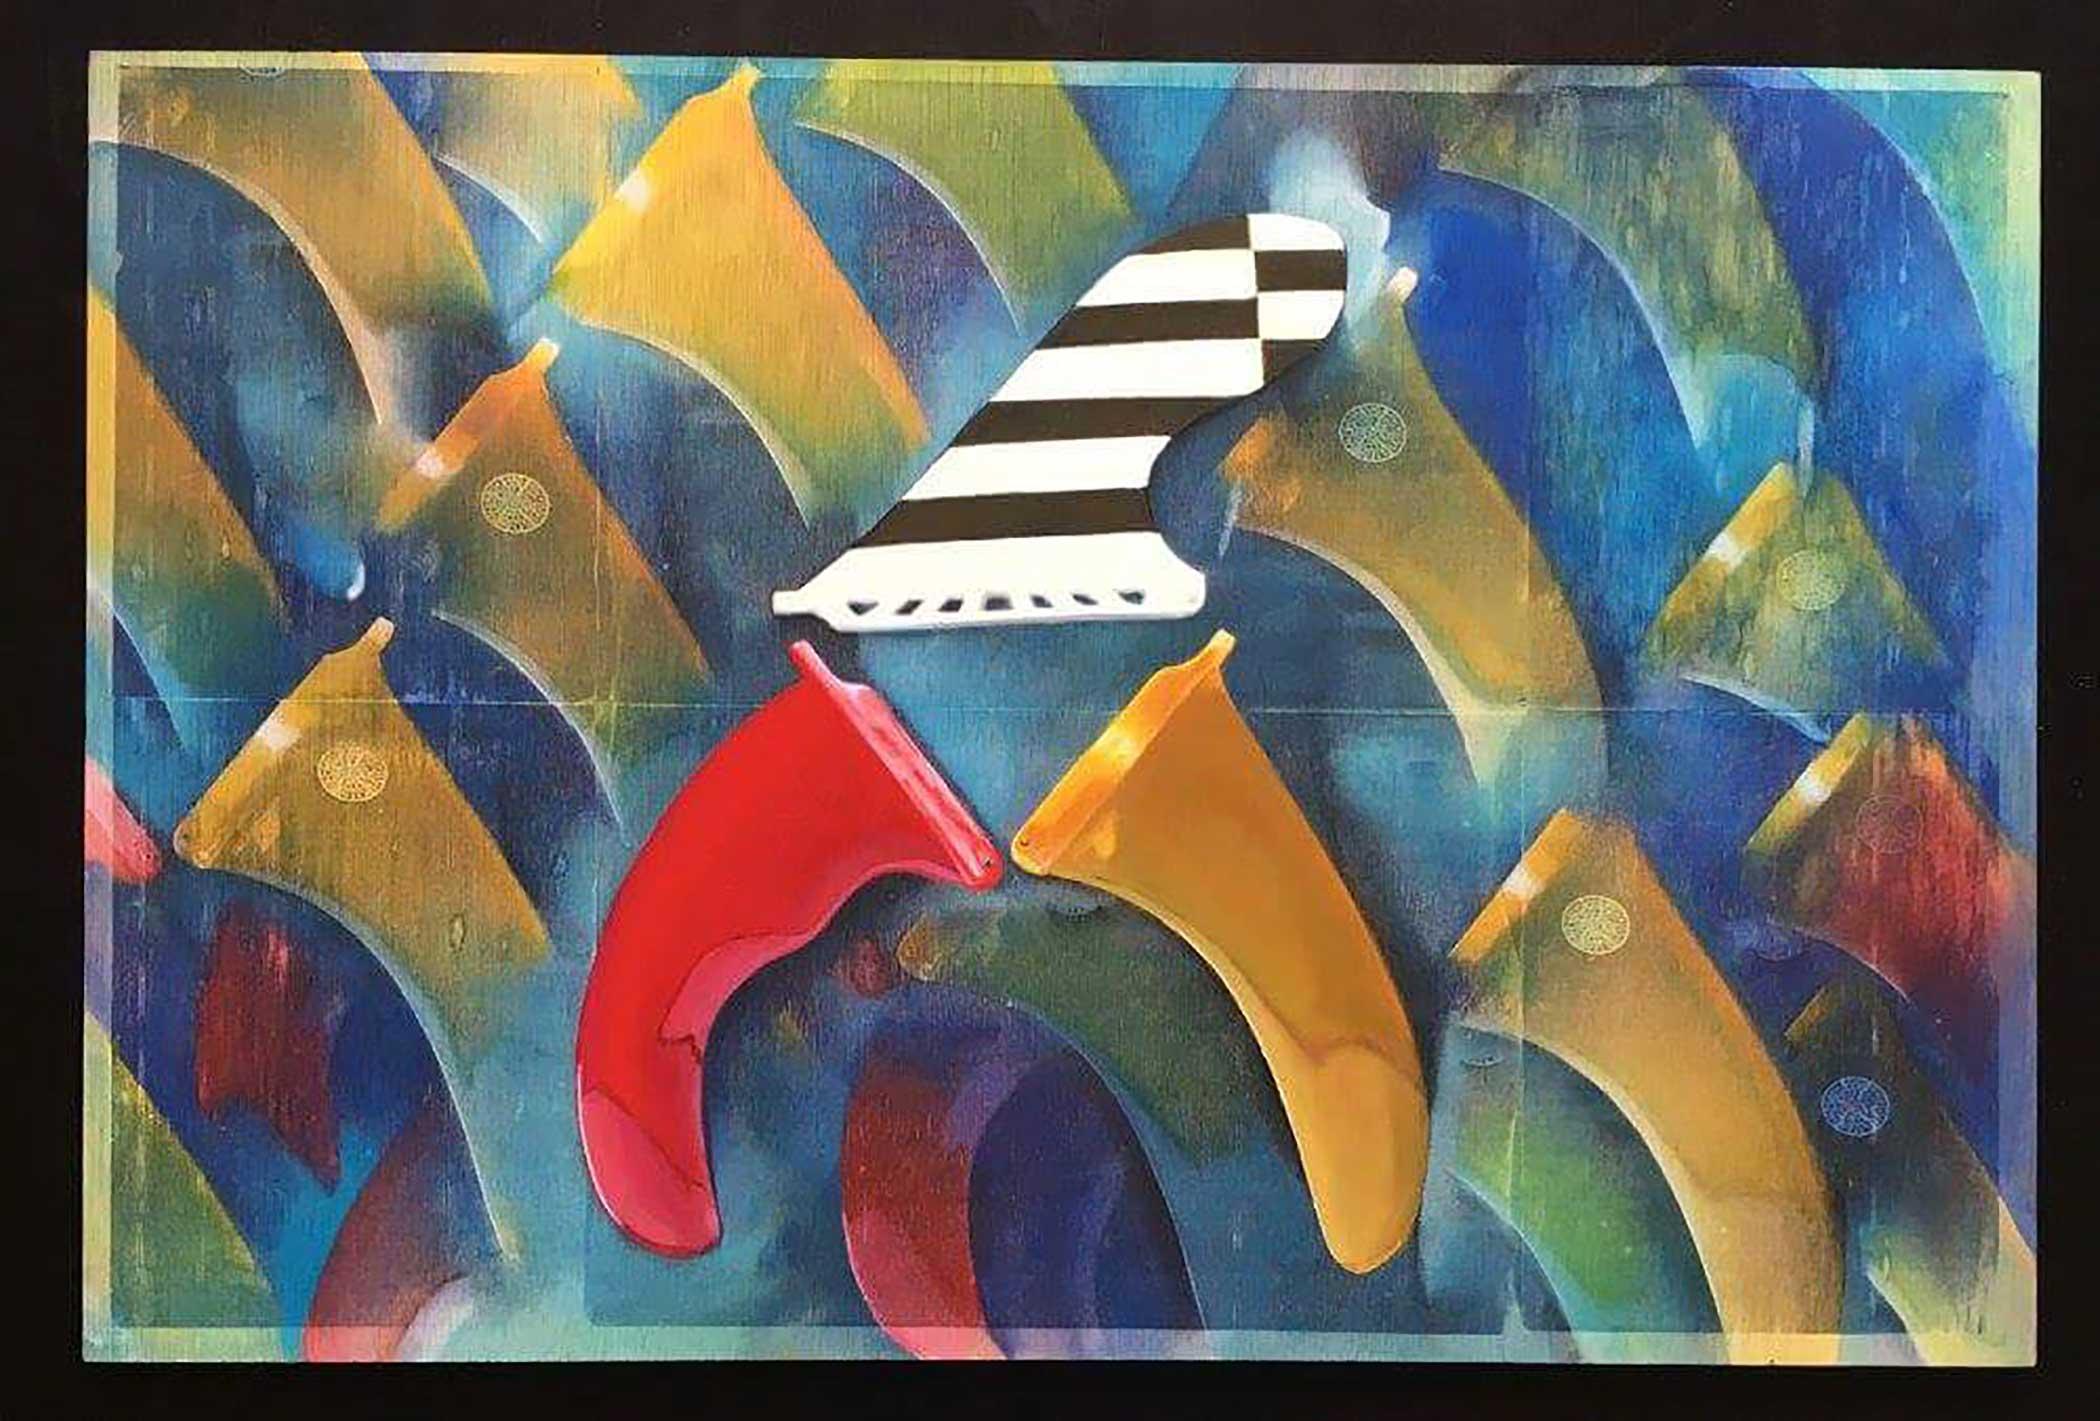 """Blue Dream"" Mixed Media/ Oil on Wood 60cm x 40cm 2016"